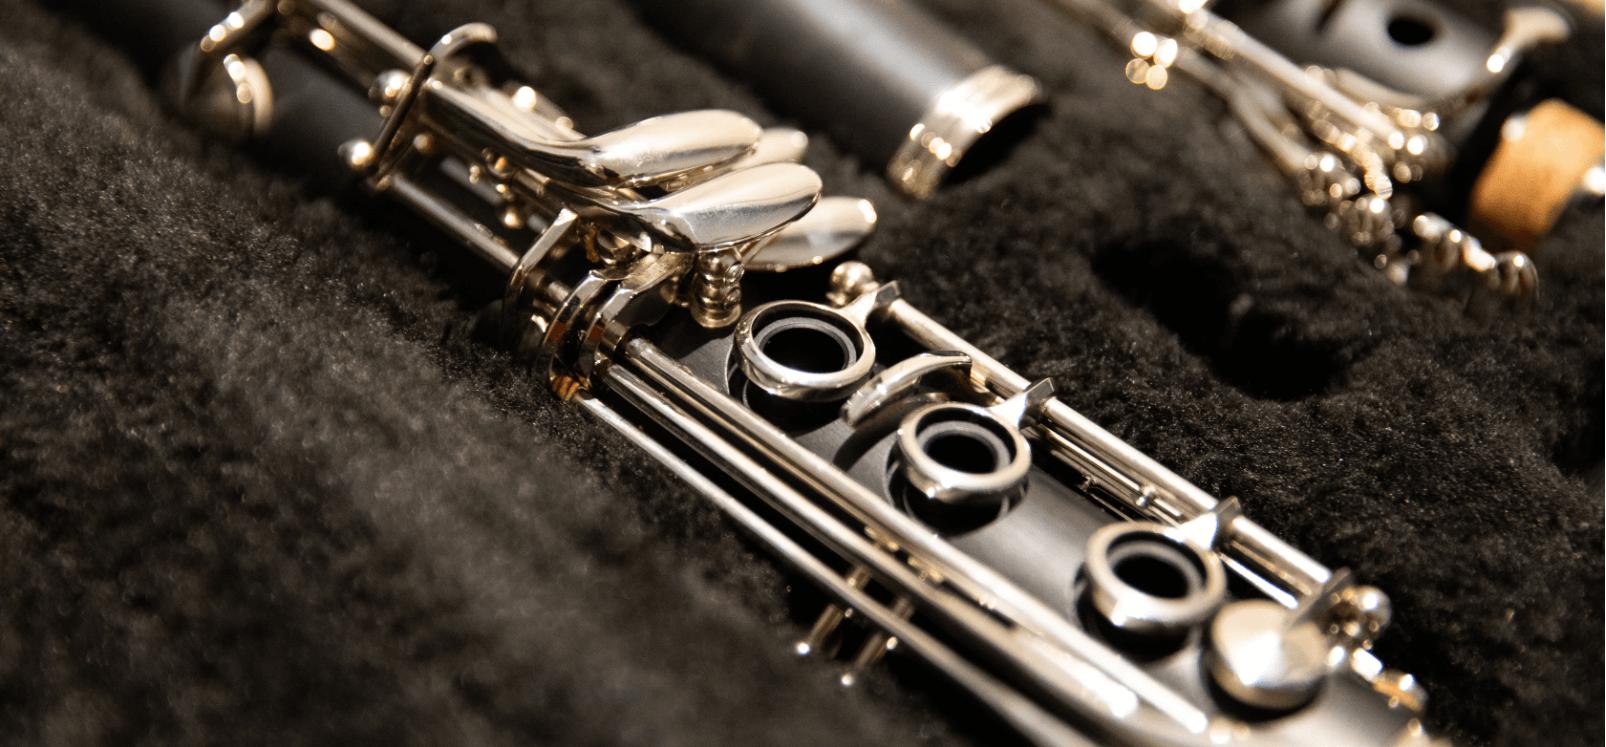 Music4All Lemne 3 Clarinet 6